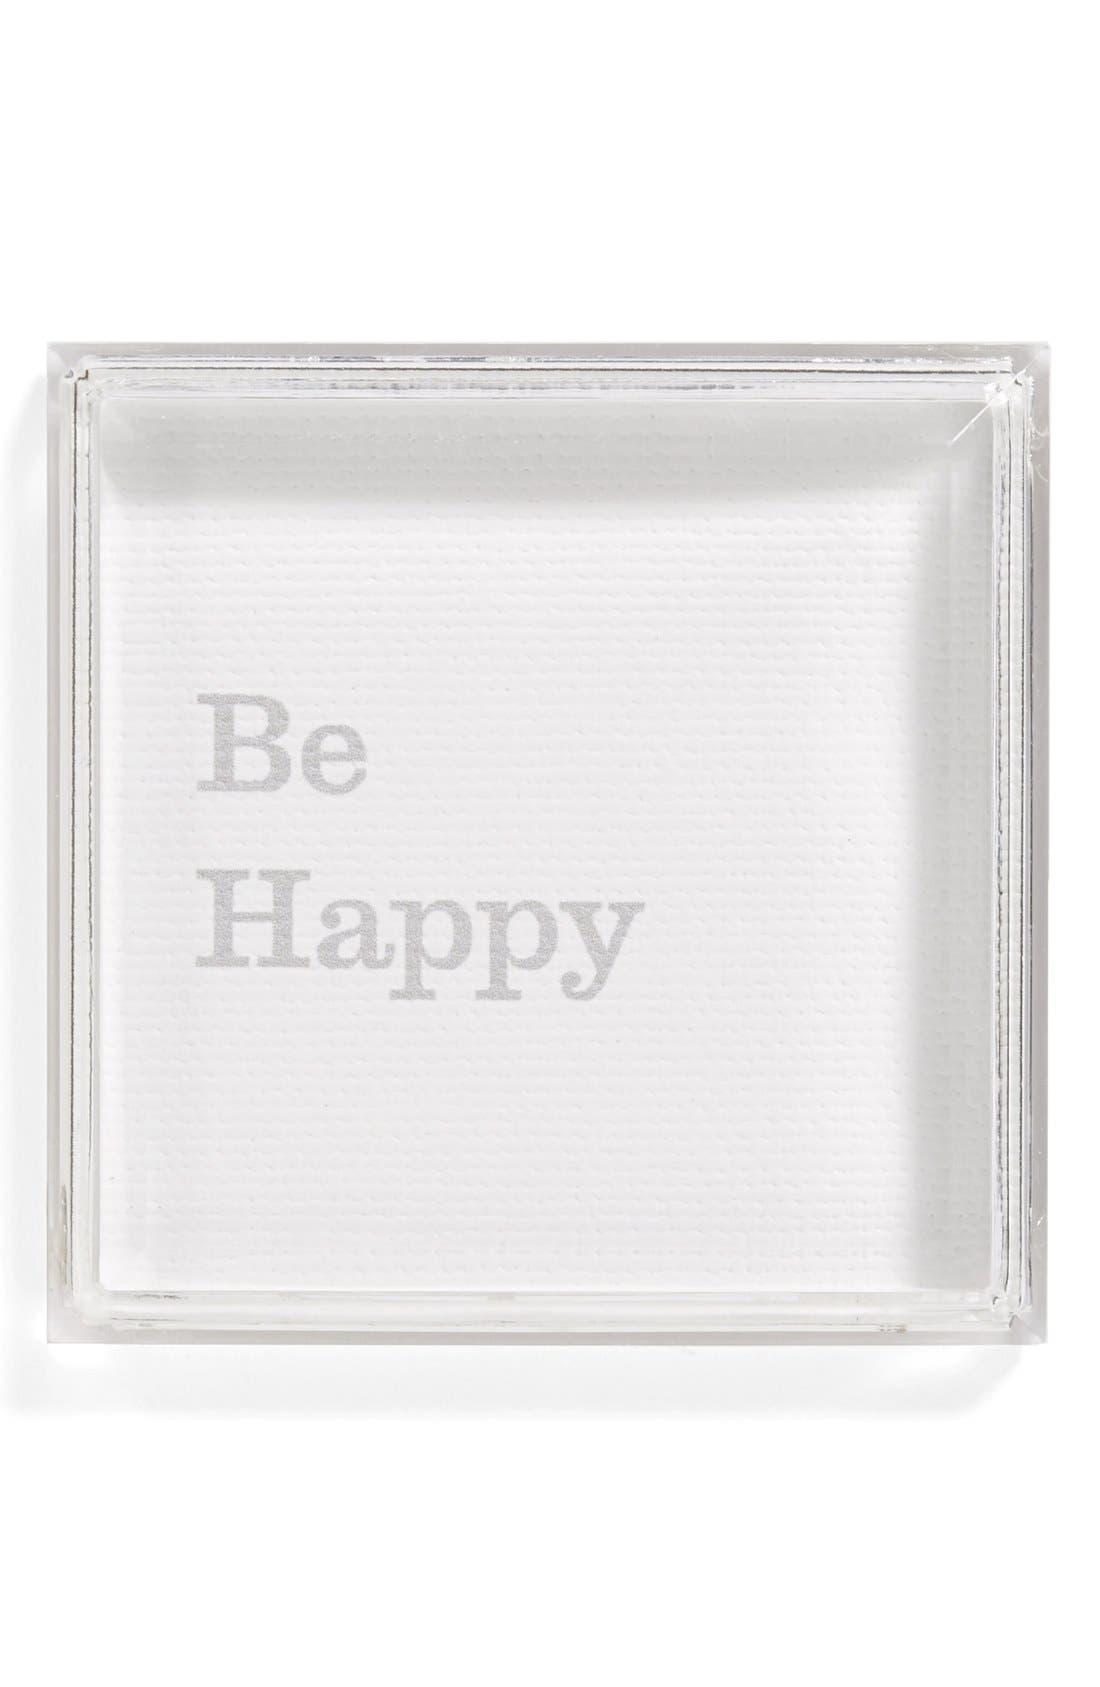 Alternate Image 1 Selected - Petal Lane 'Be Happy' Magnet